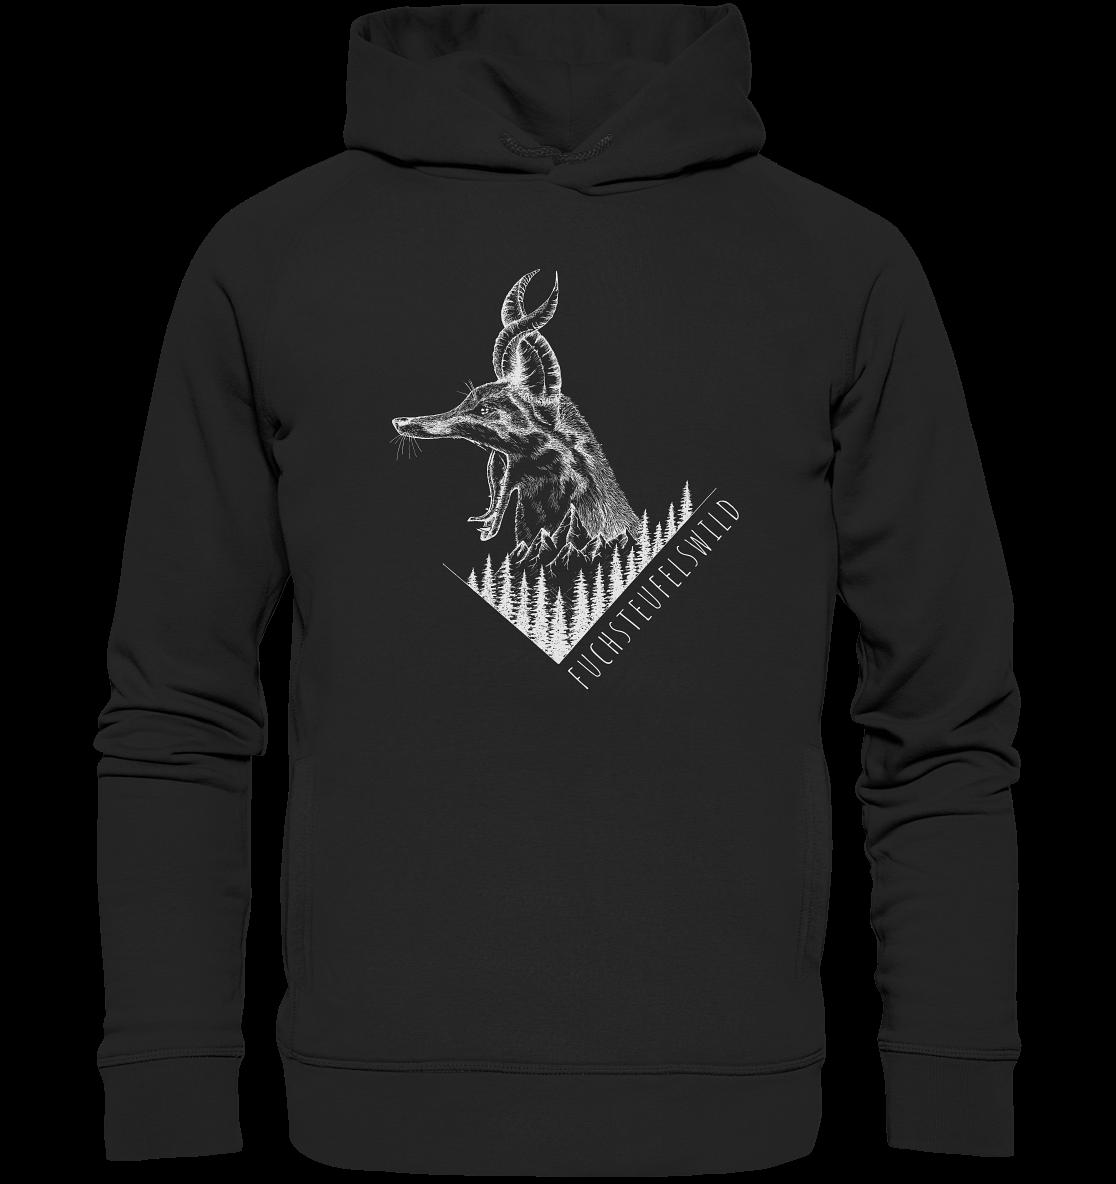 front-organic-fashion-hoodie-272727-1116x-3.png